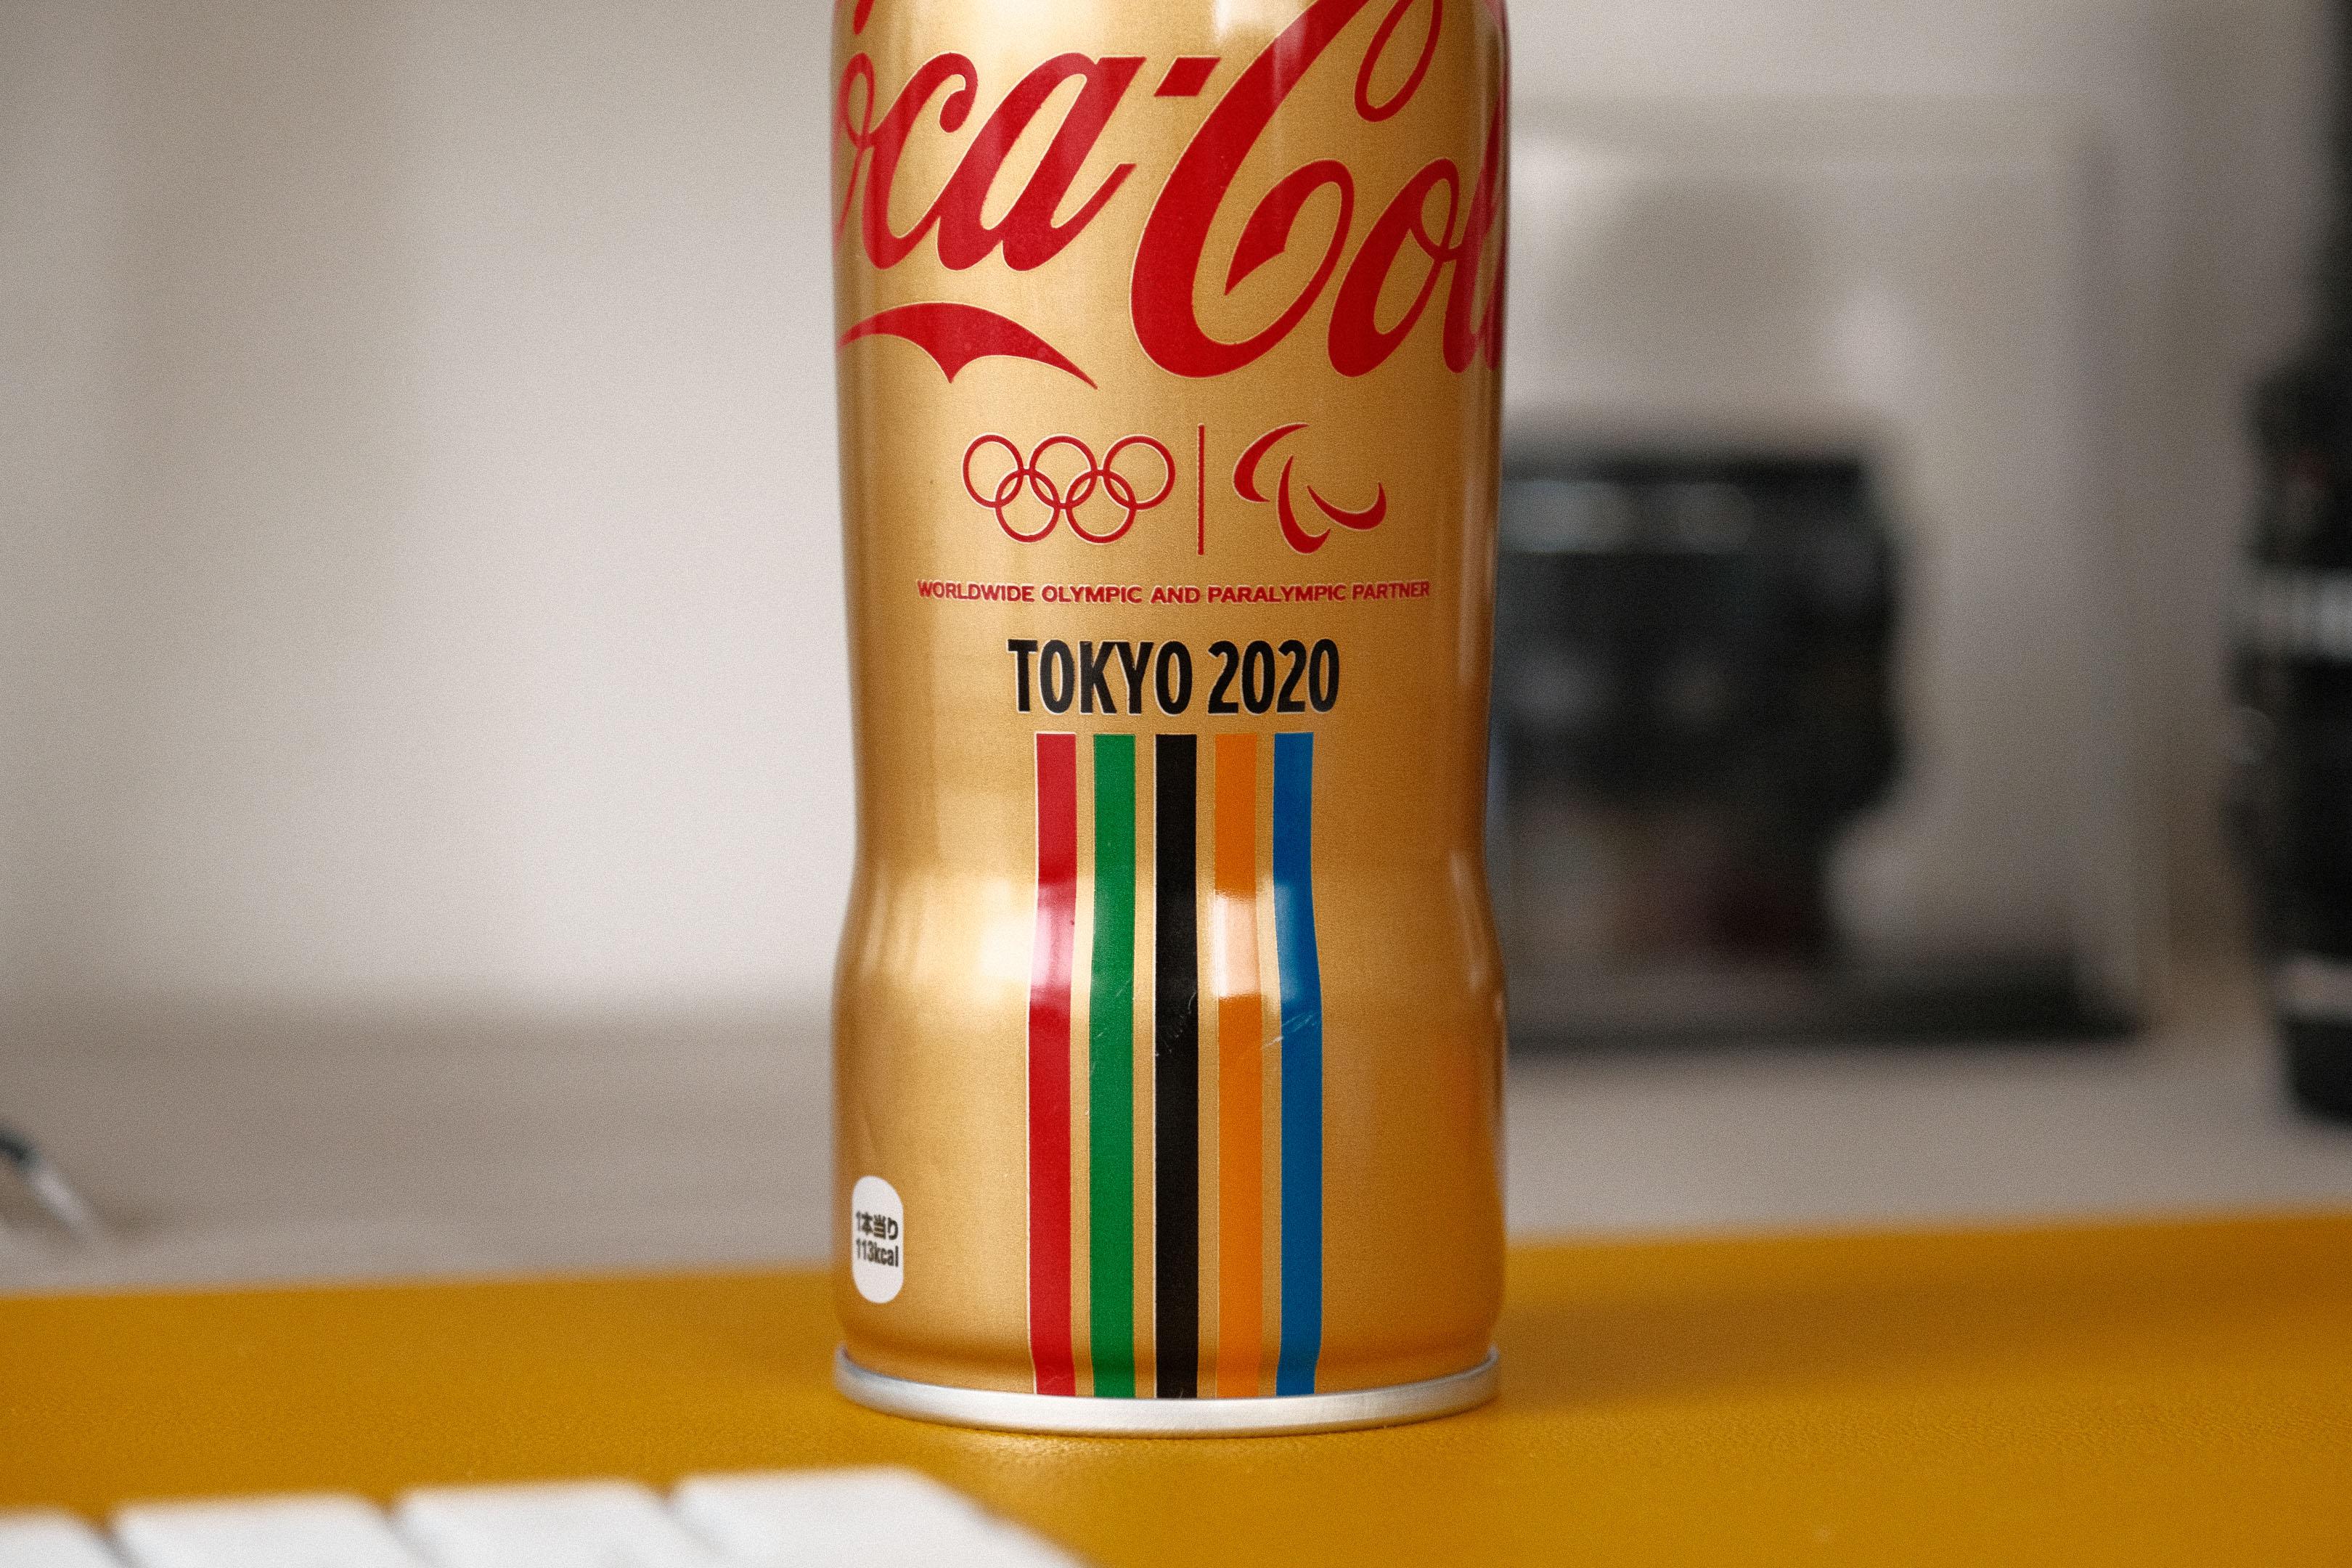 Coca-cola Tokyo 2020 un skrējiens